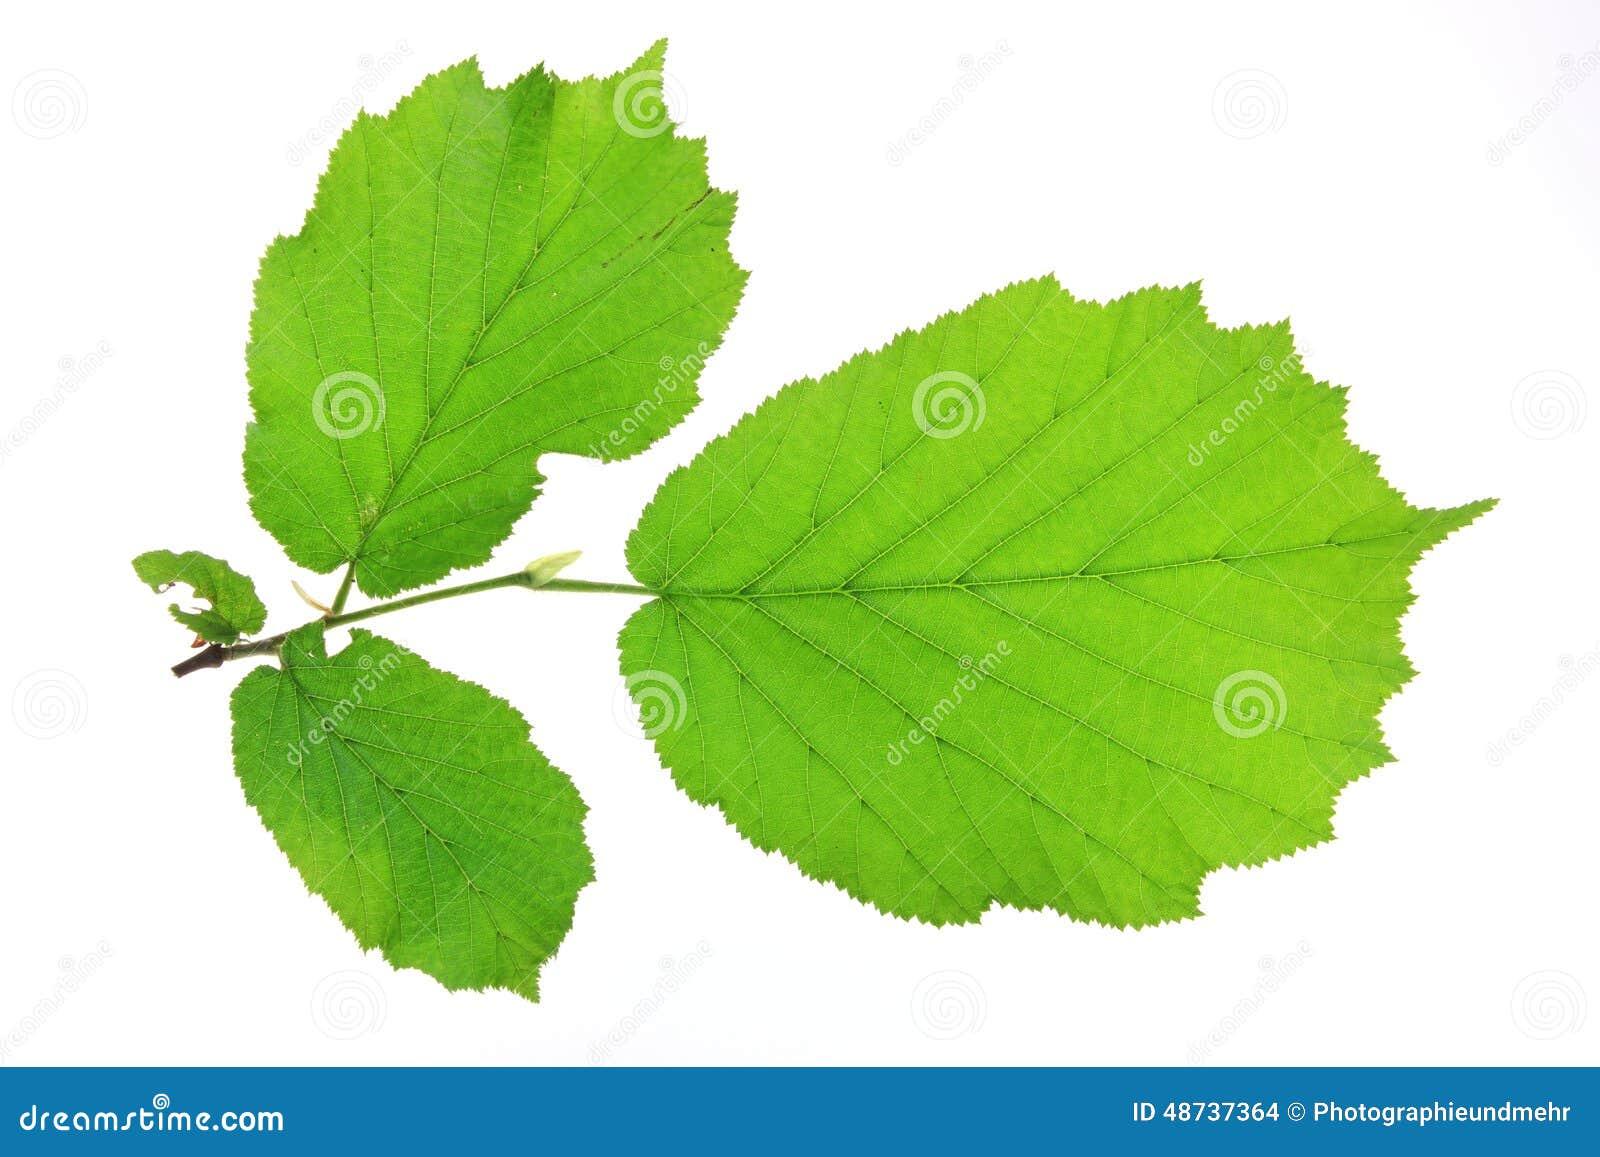 Leaves Of The Hazel Tree (Corylus Avellana) Stock Photo ...